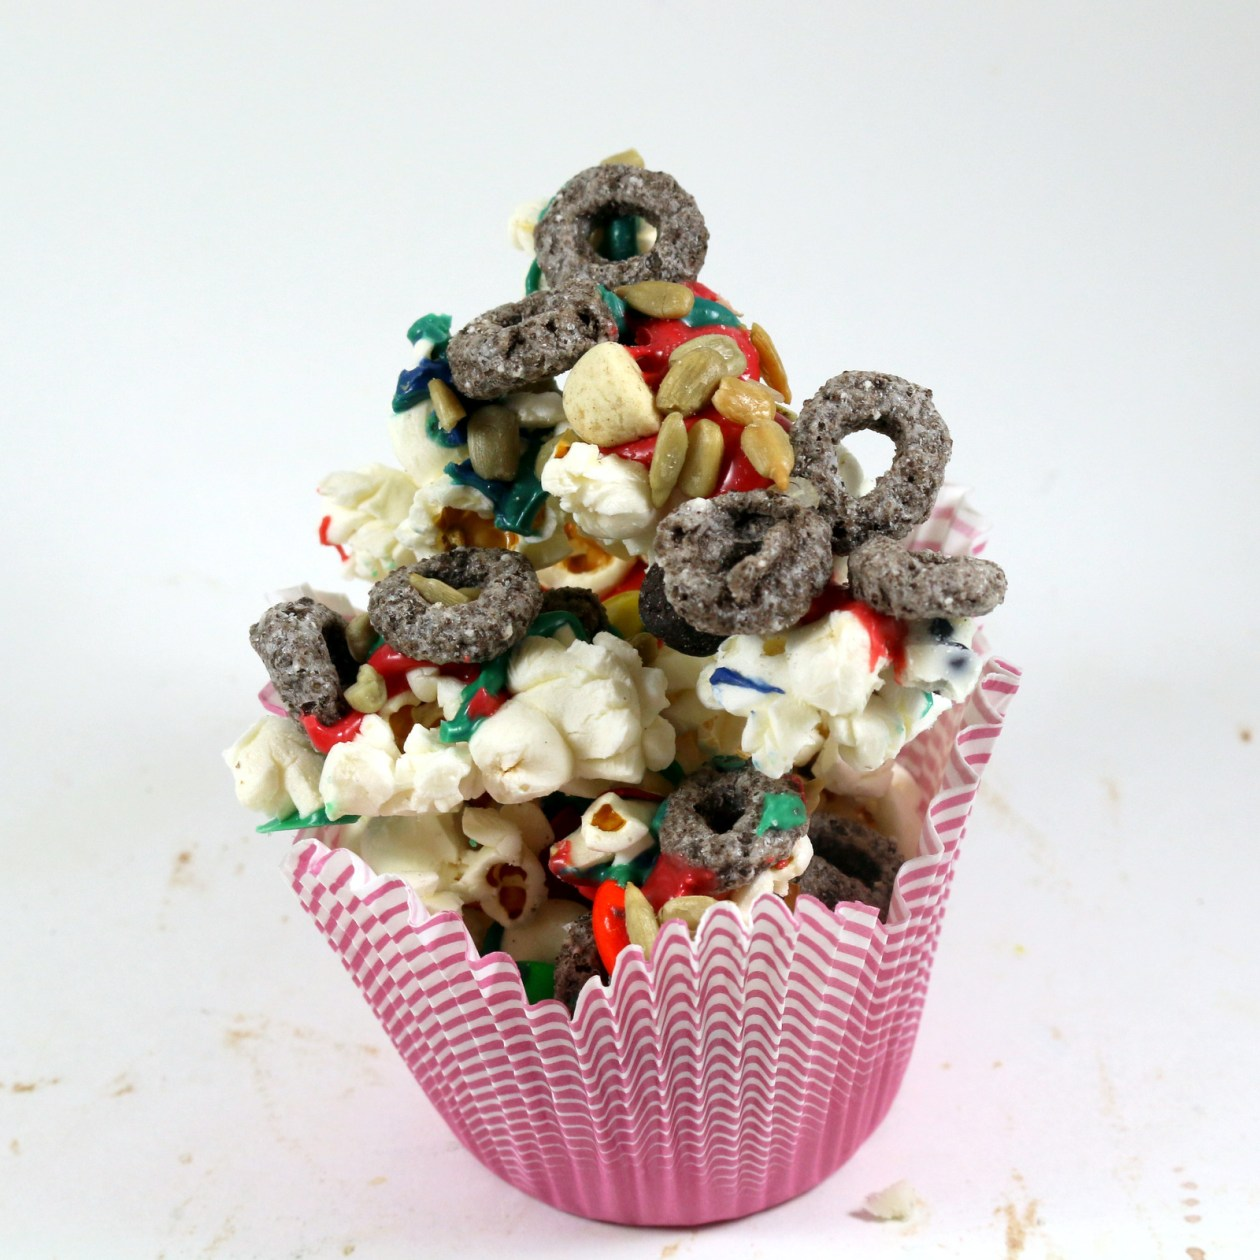 5 star popcorn from best food blog 5starcookies